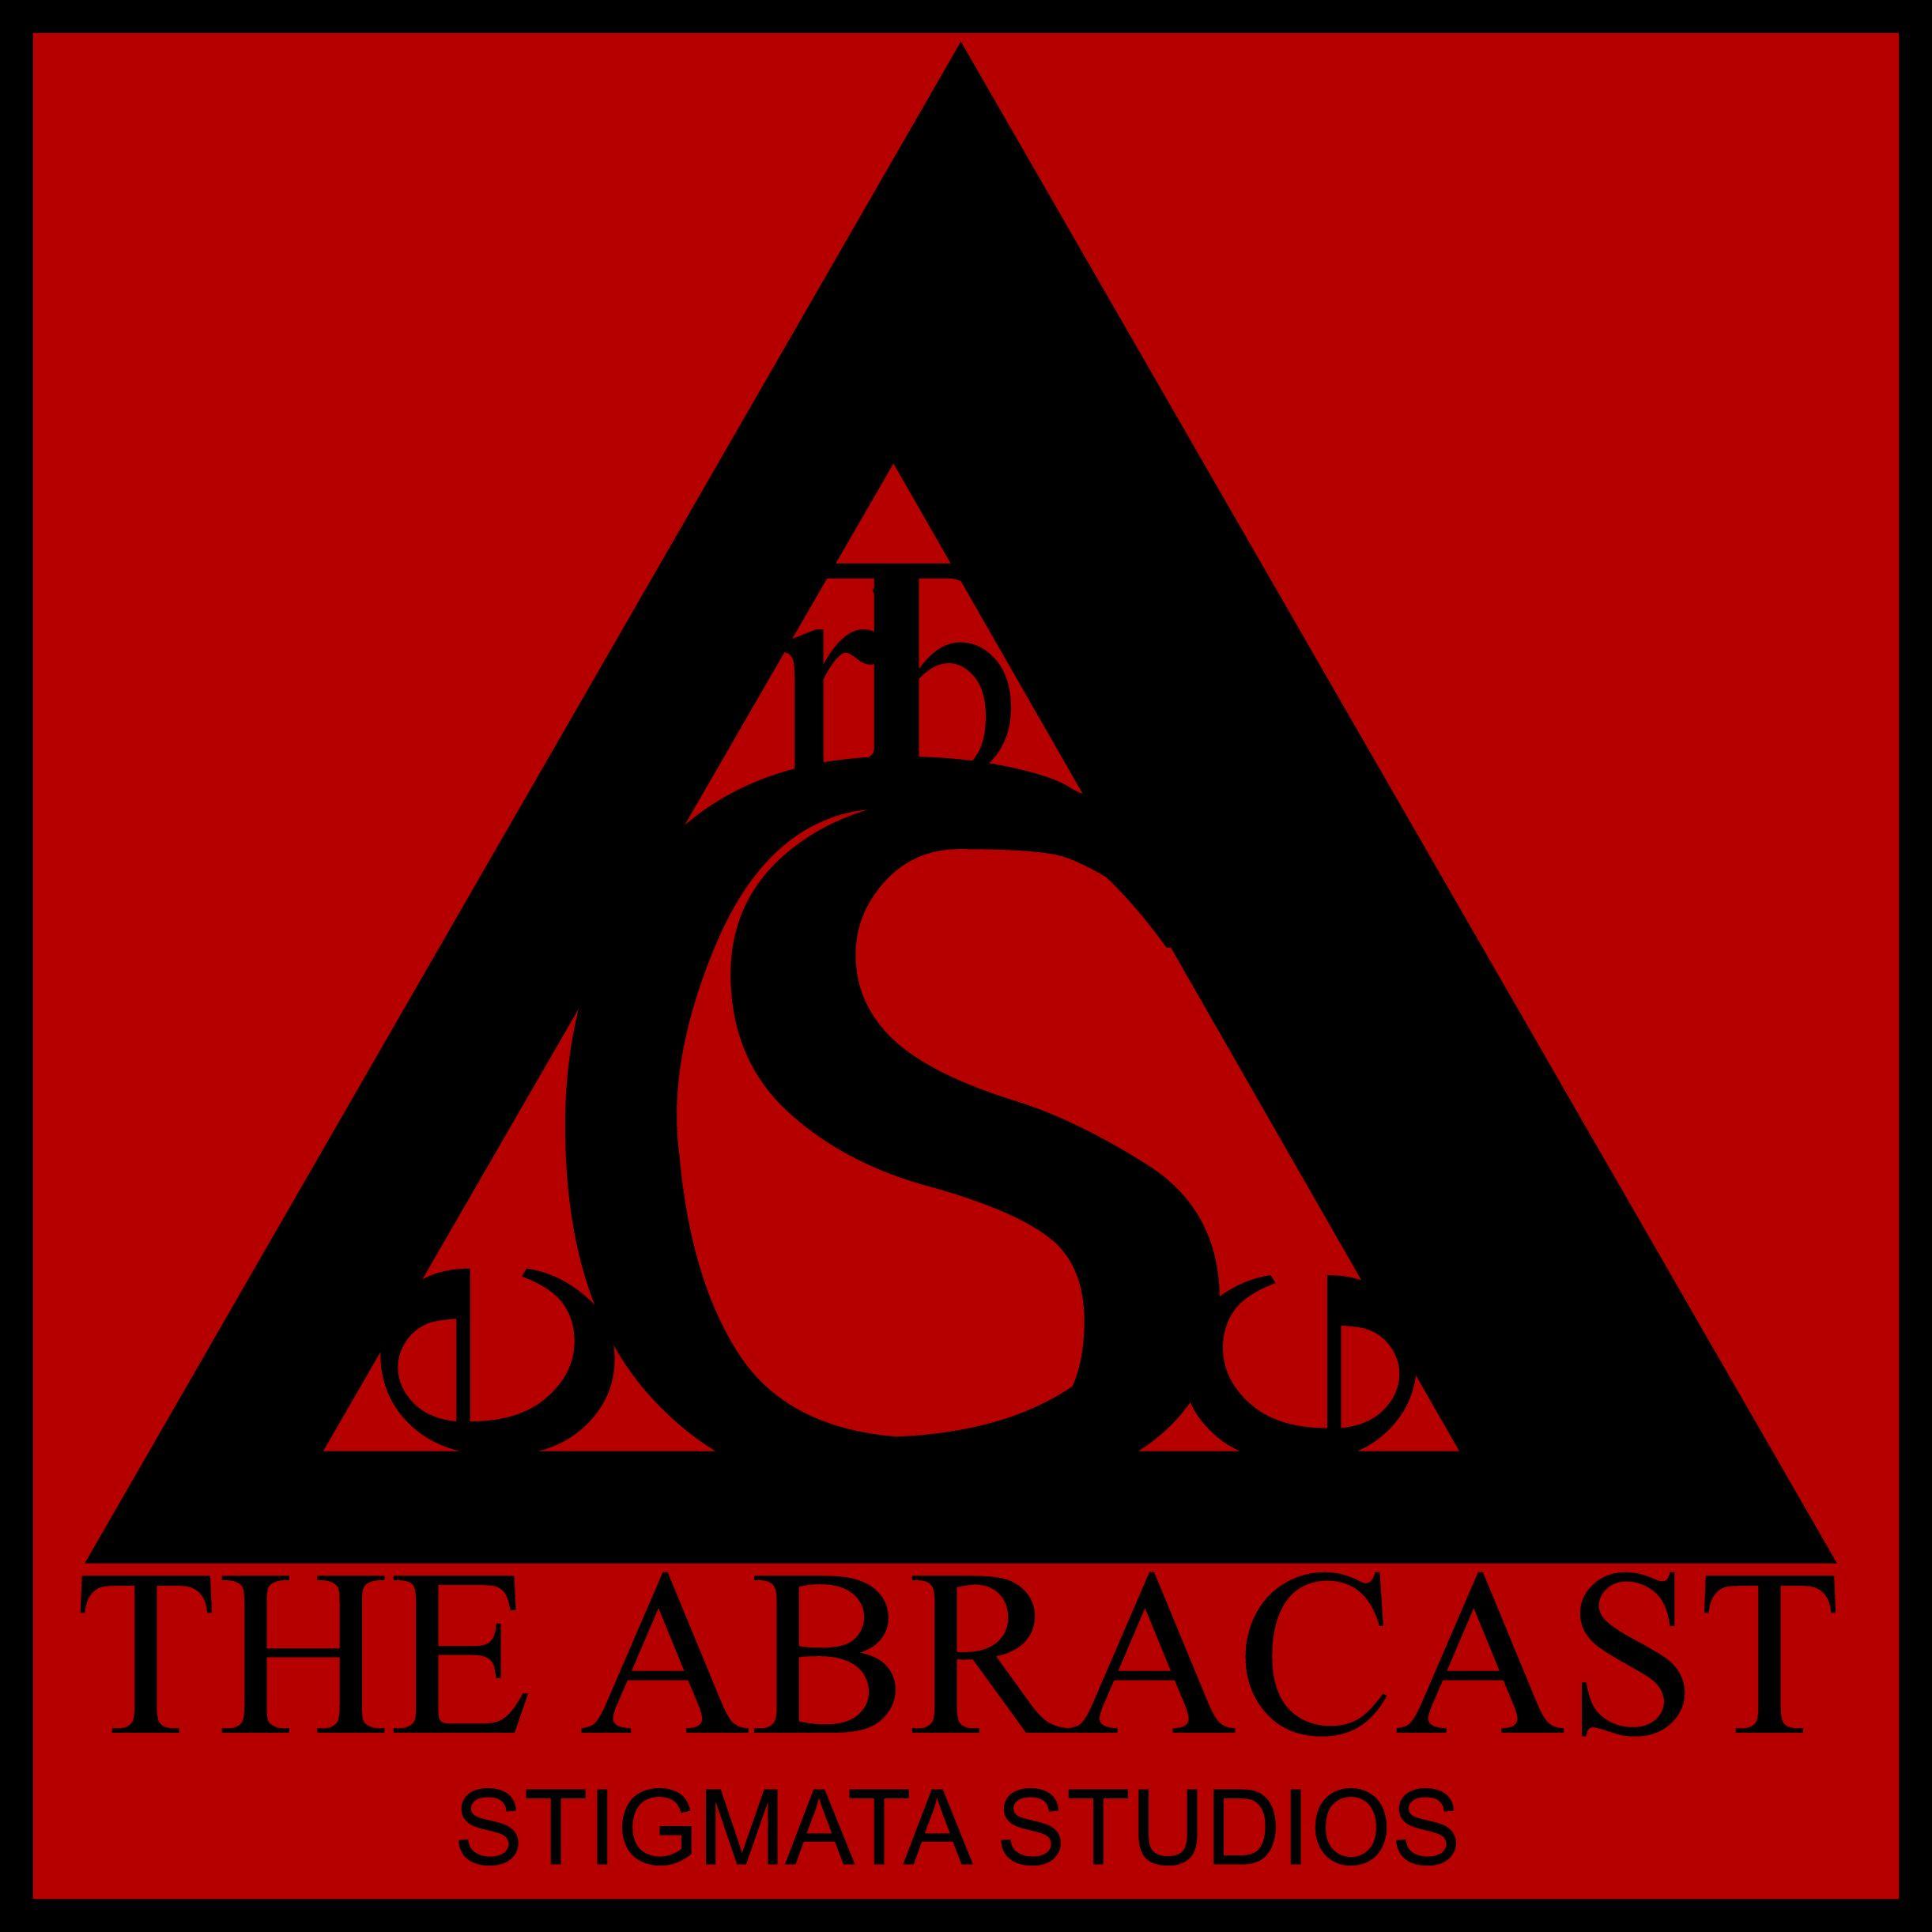 The Abracast